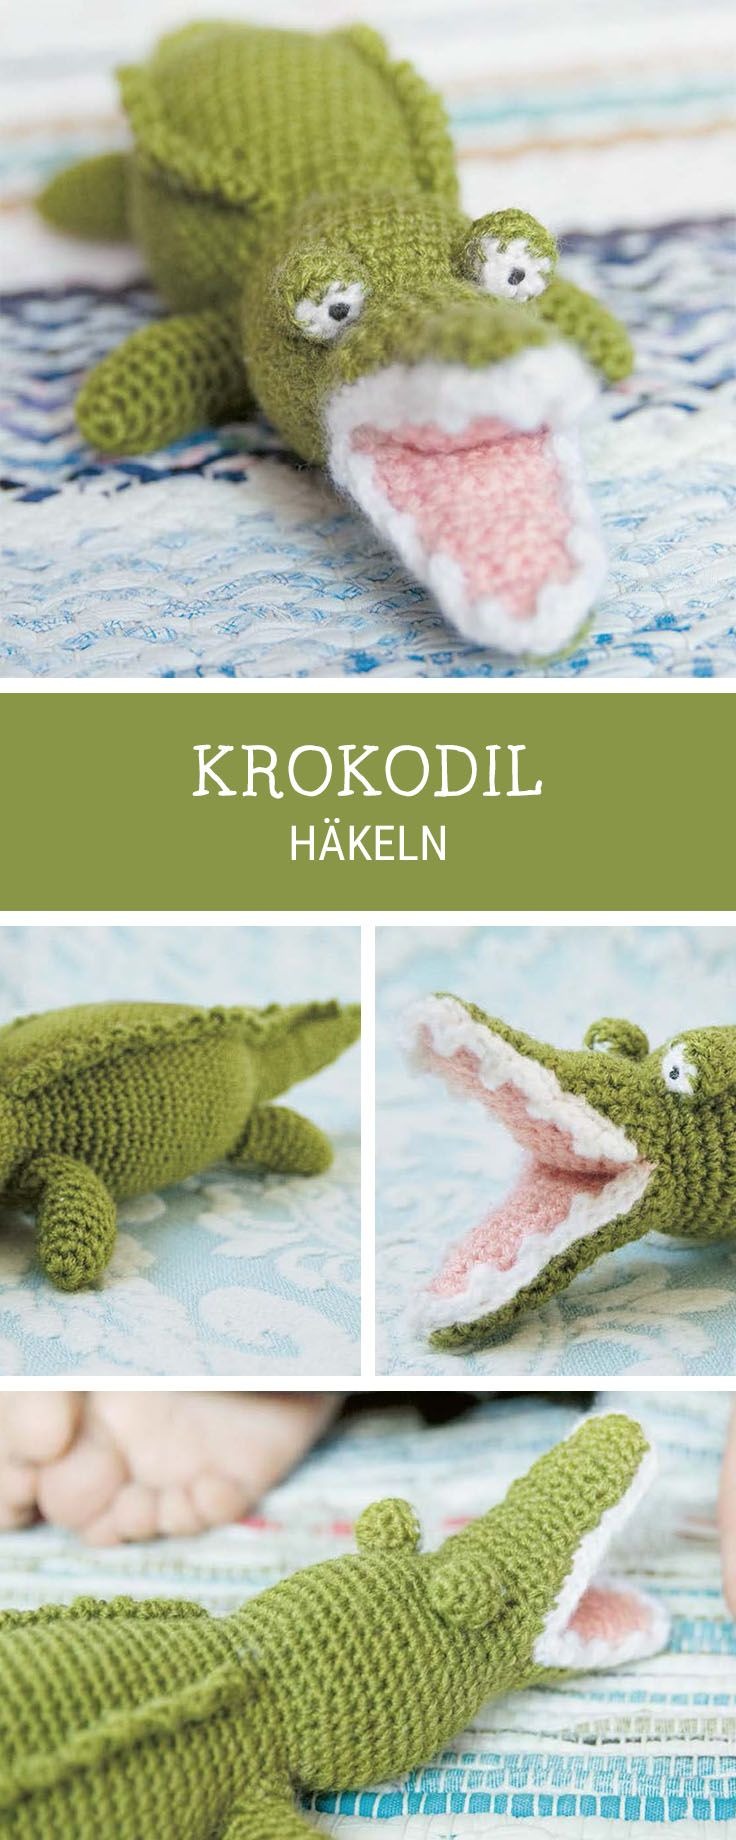 Häkeln - DIY-Anleitungen | Pinterest | Amigurumi, Crochet and Free ...